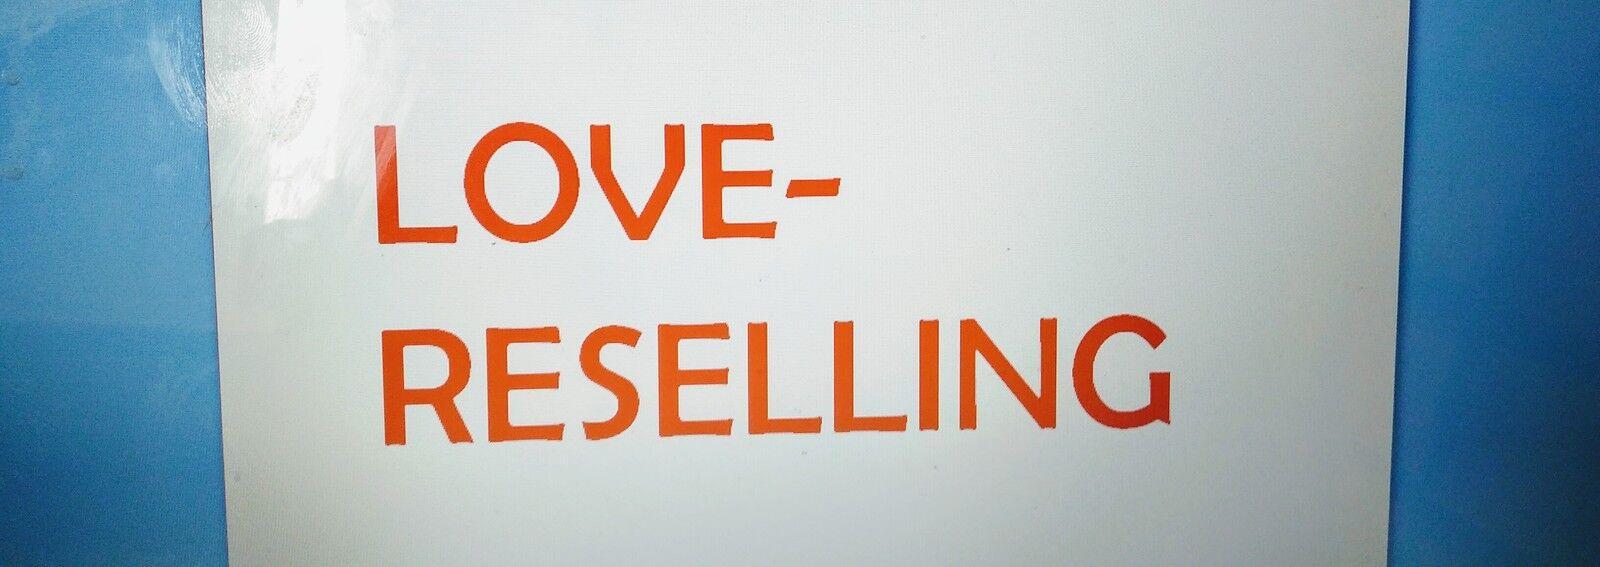 Lovereselling